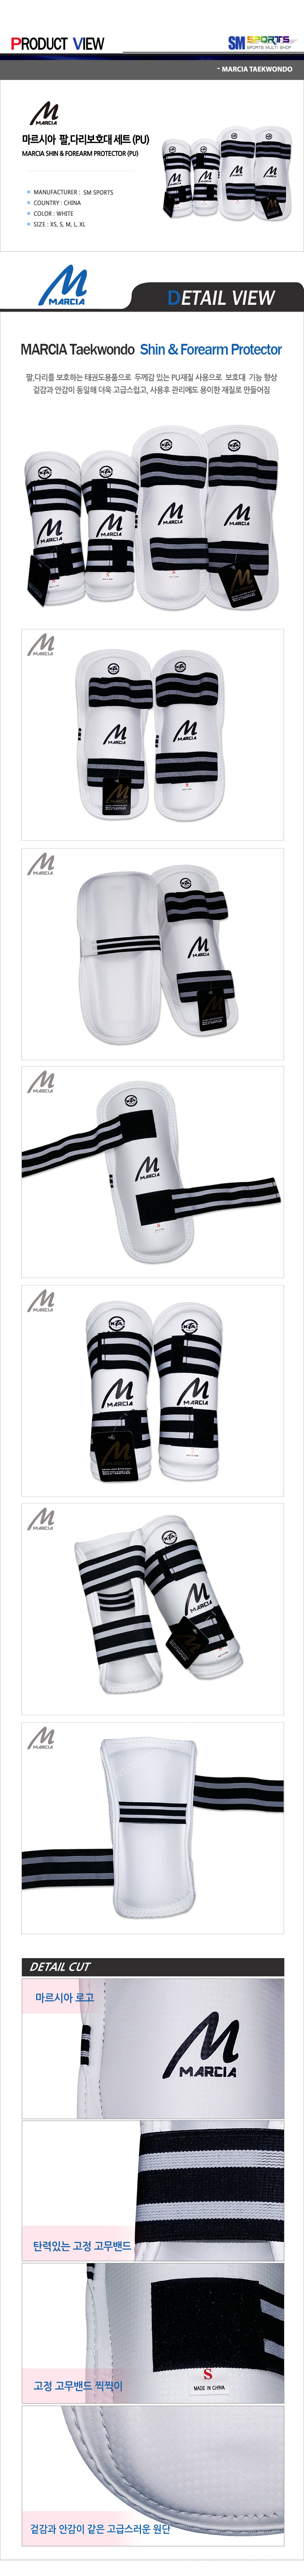 marcia_shin-forearm_protector_set-pu